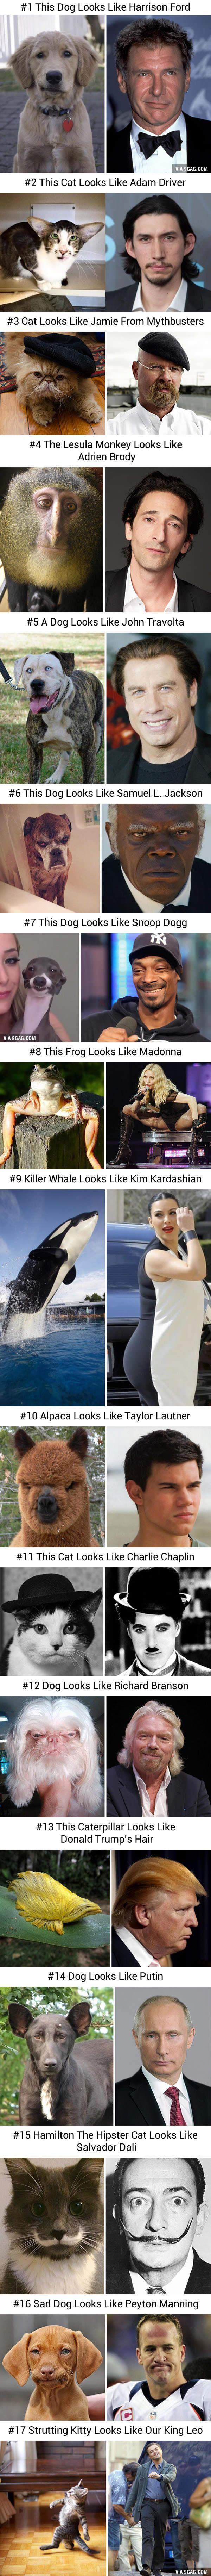 17 Animals Who Look Exactly Like Famous People